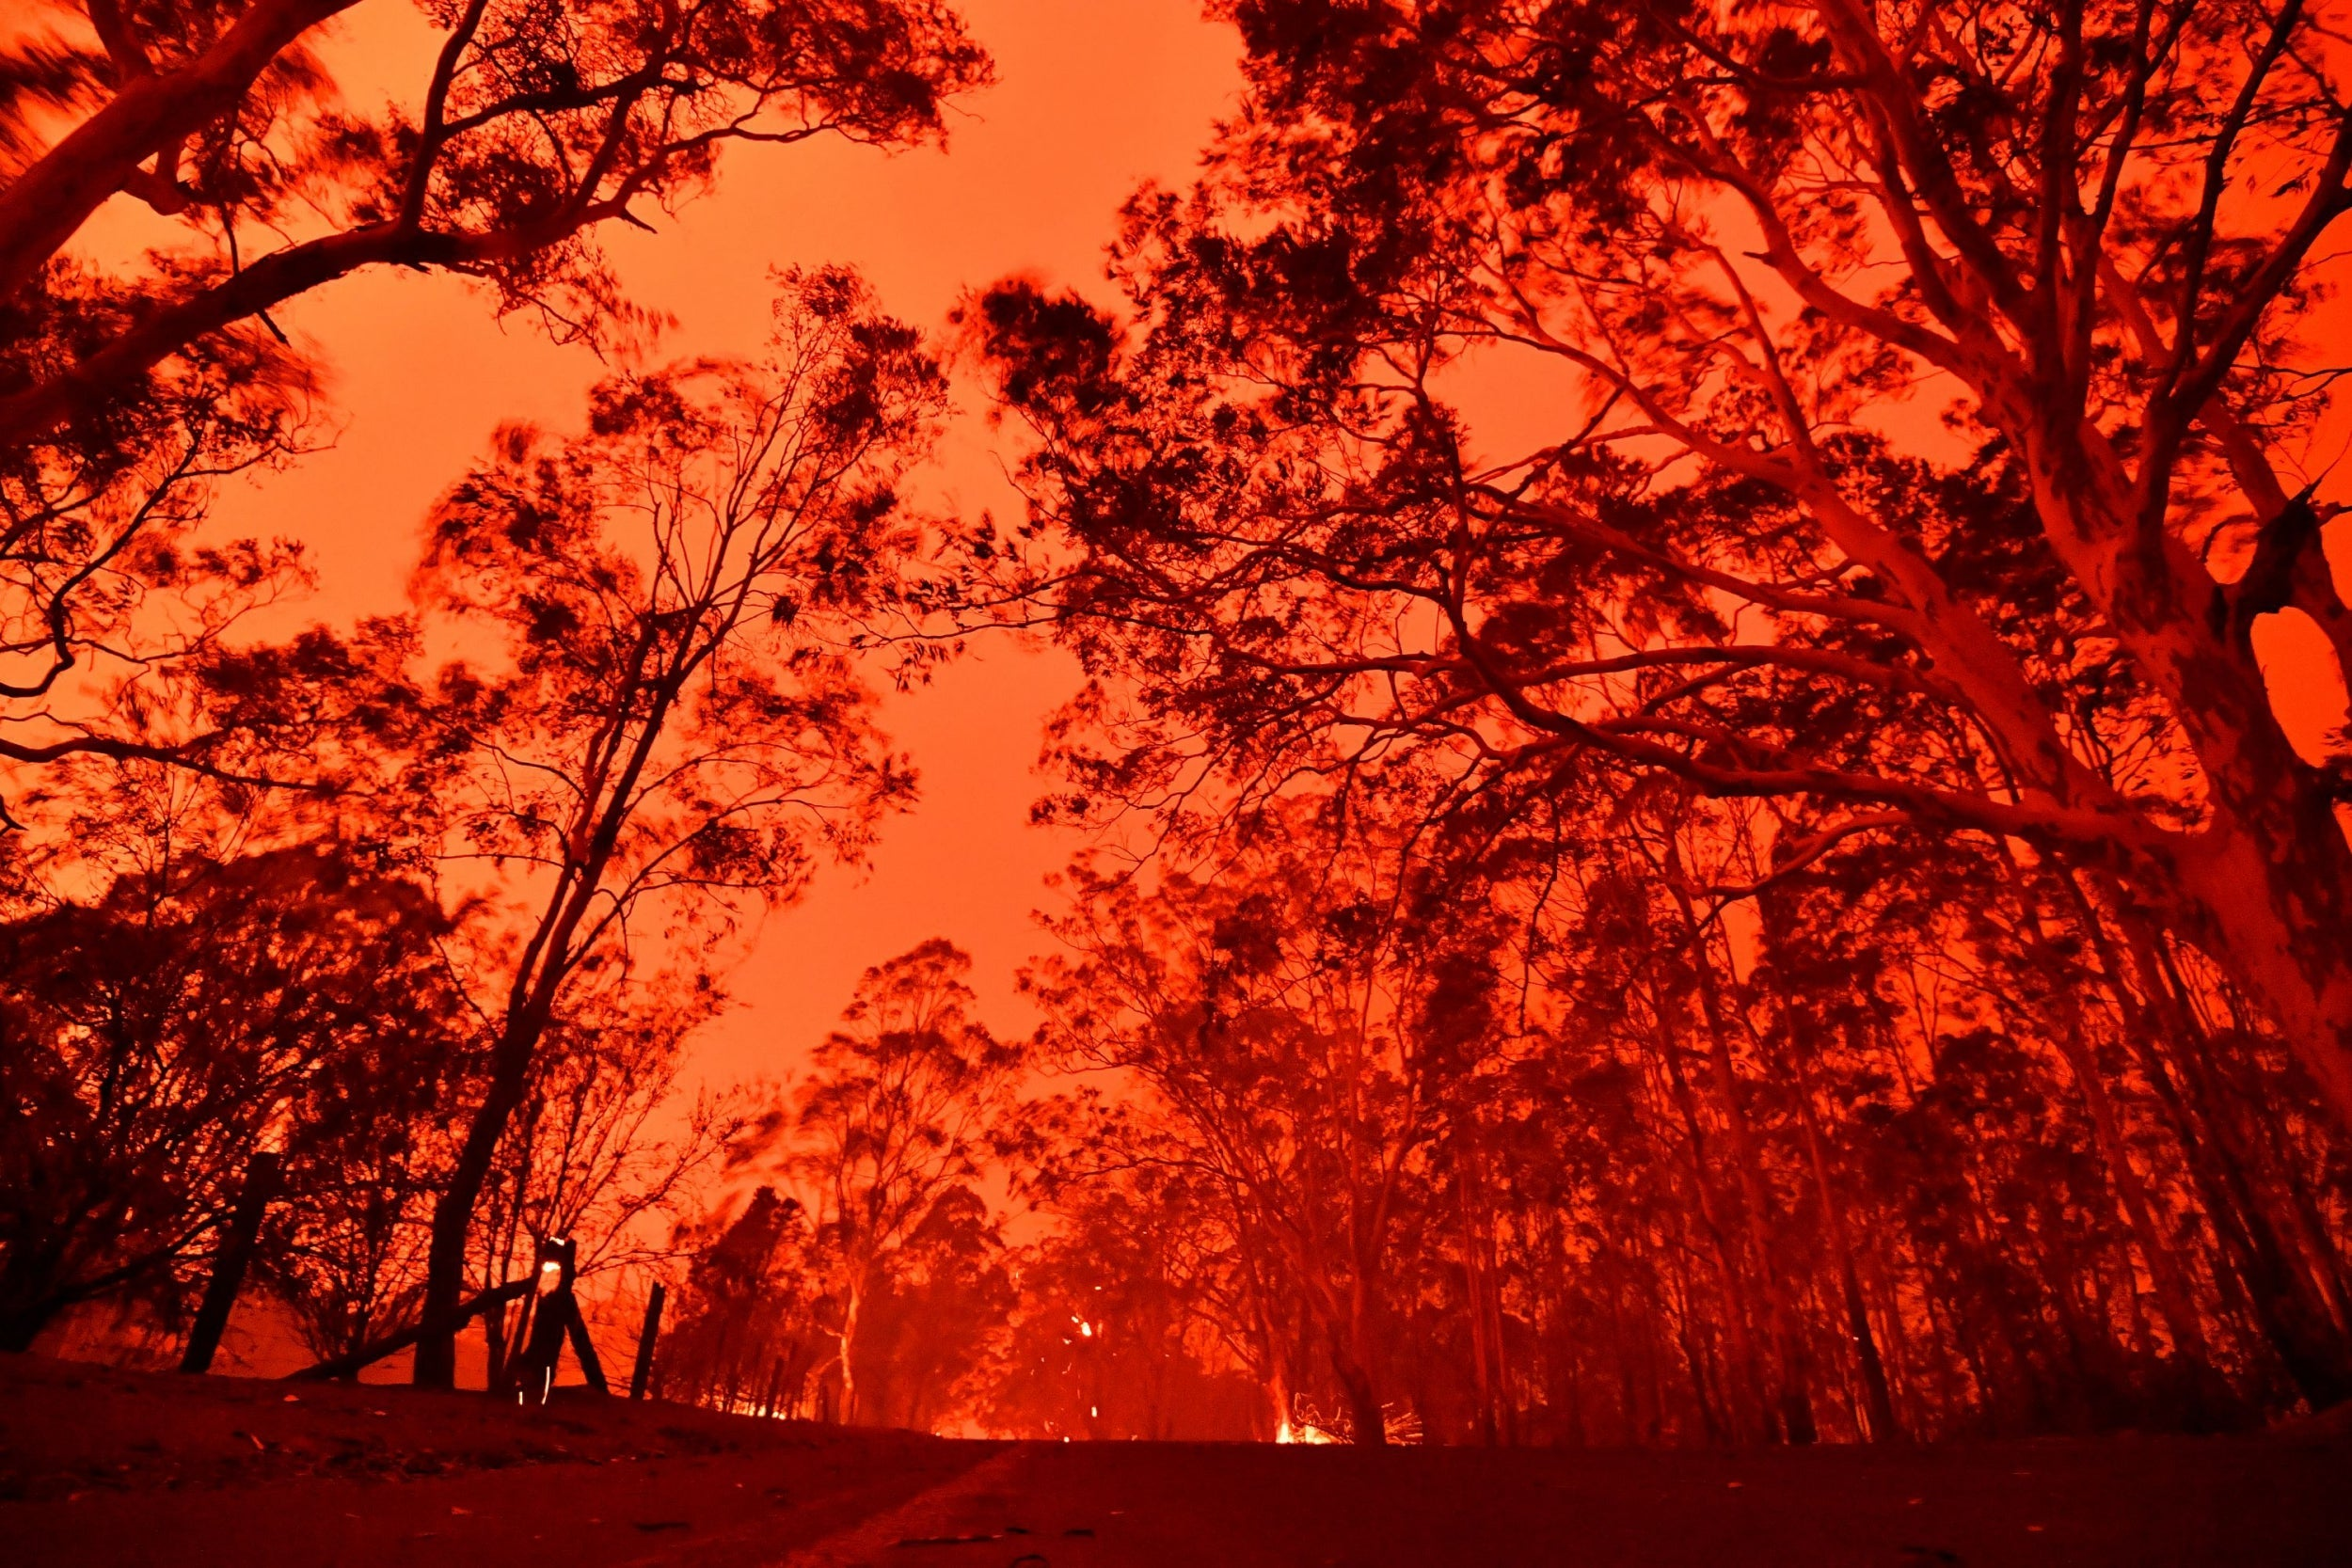 https://static.independent.co.uk/s3fs-public/thumbnails/image/2019/12/31/09/australia-bushfire.jpg